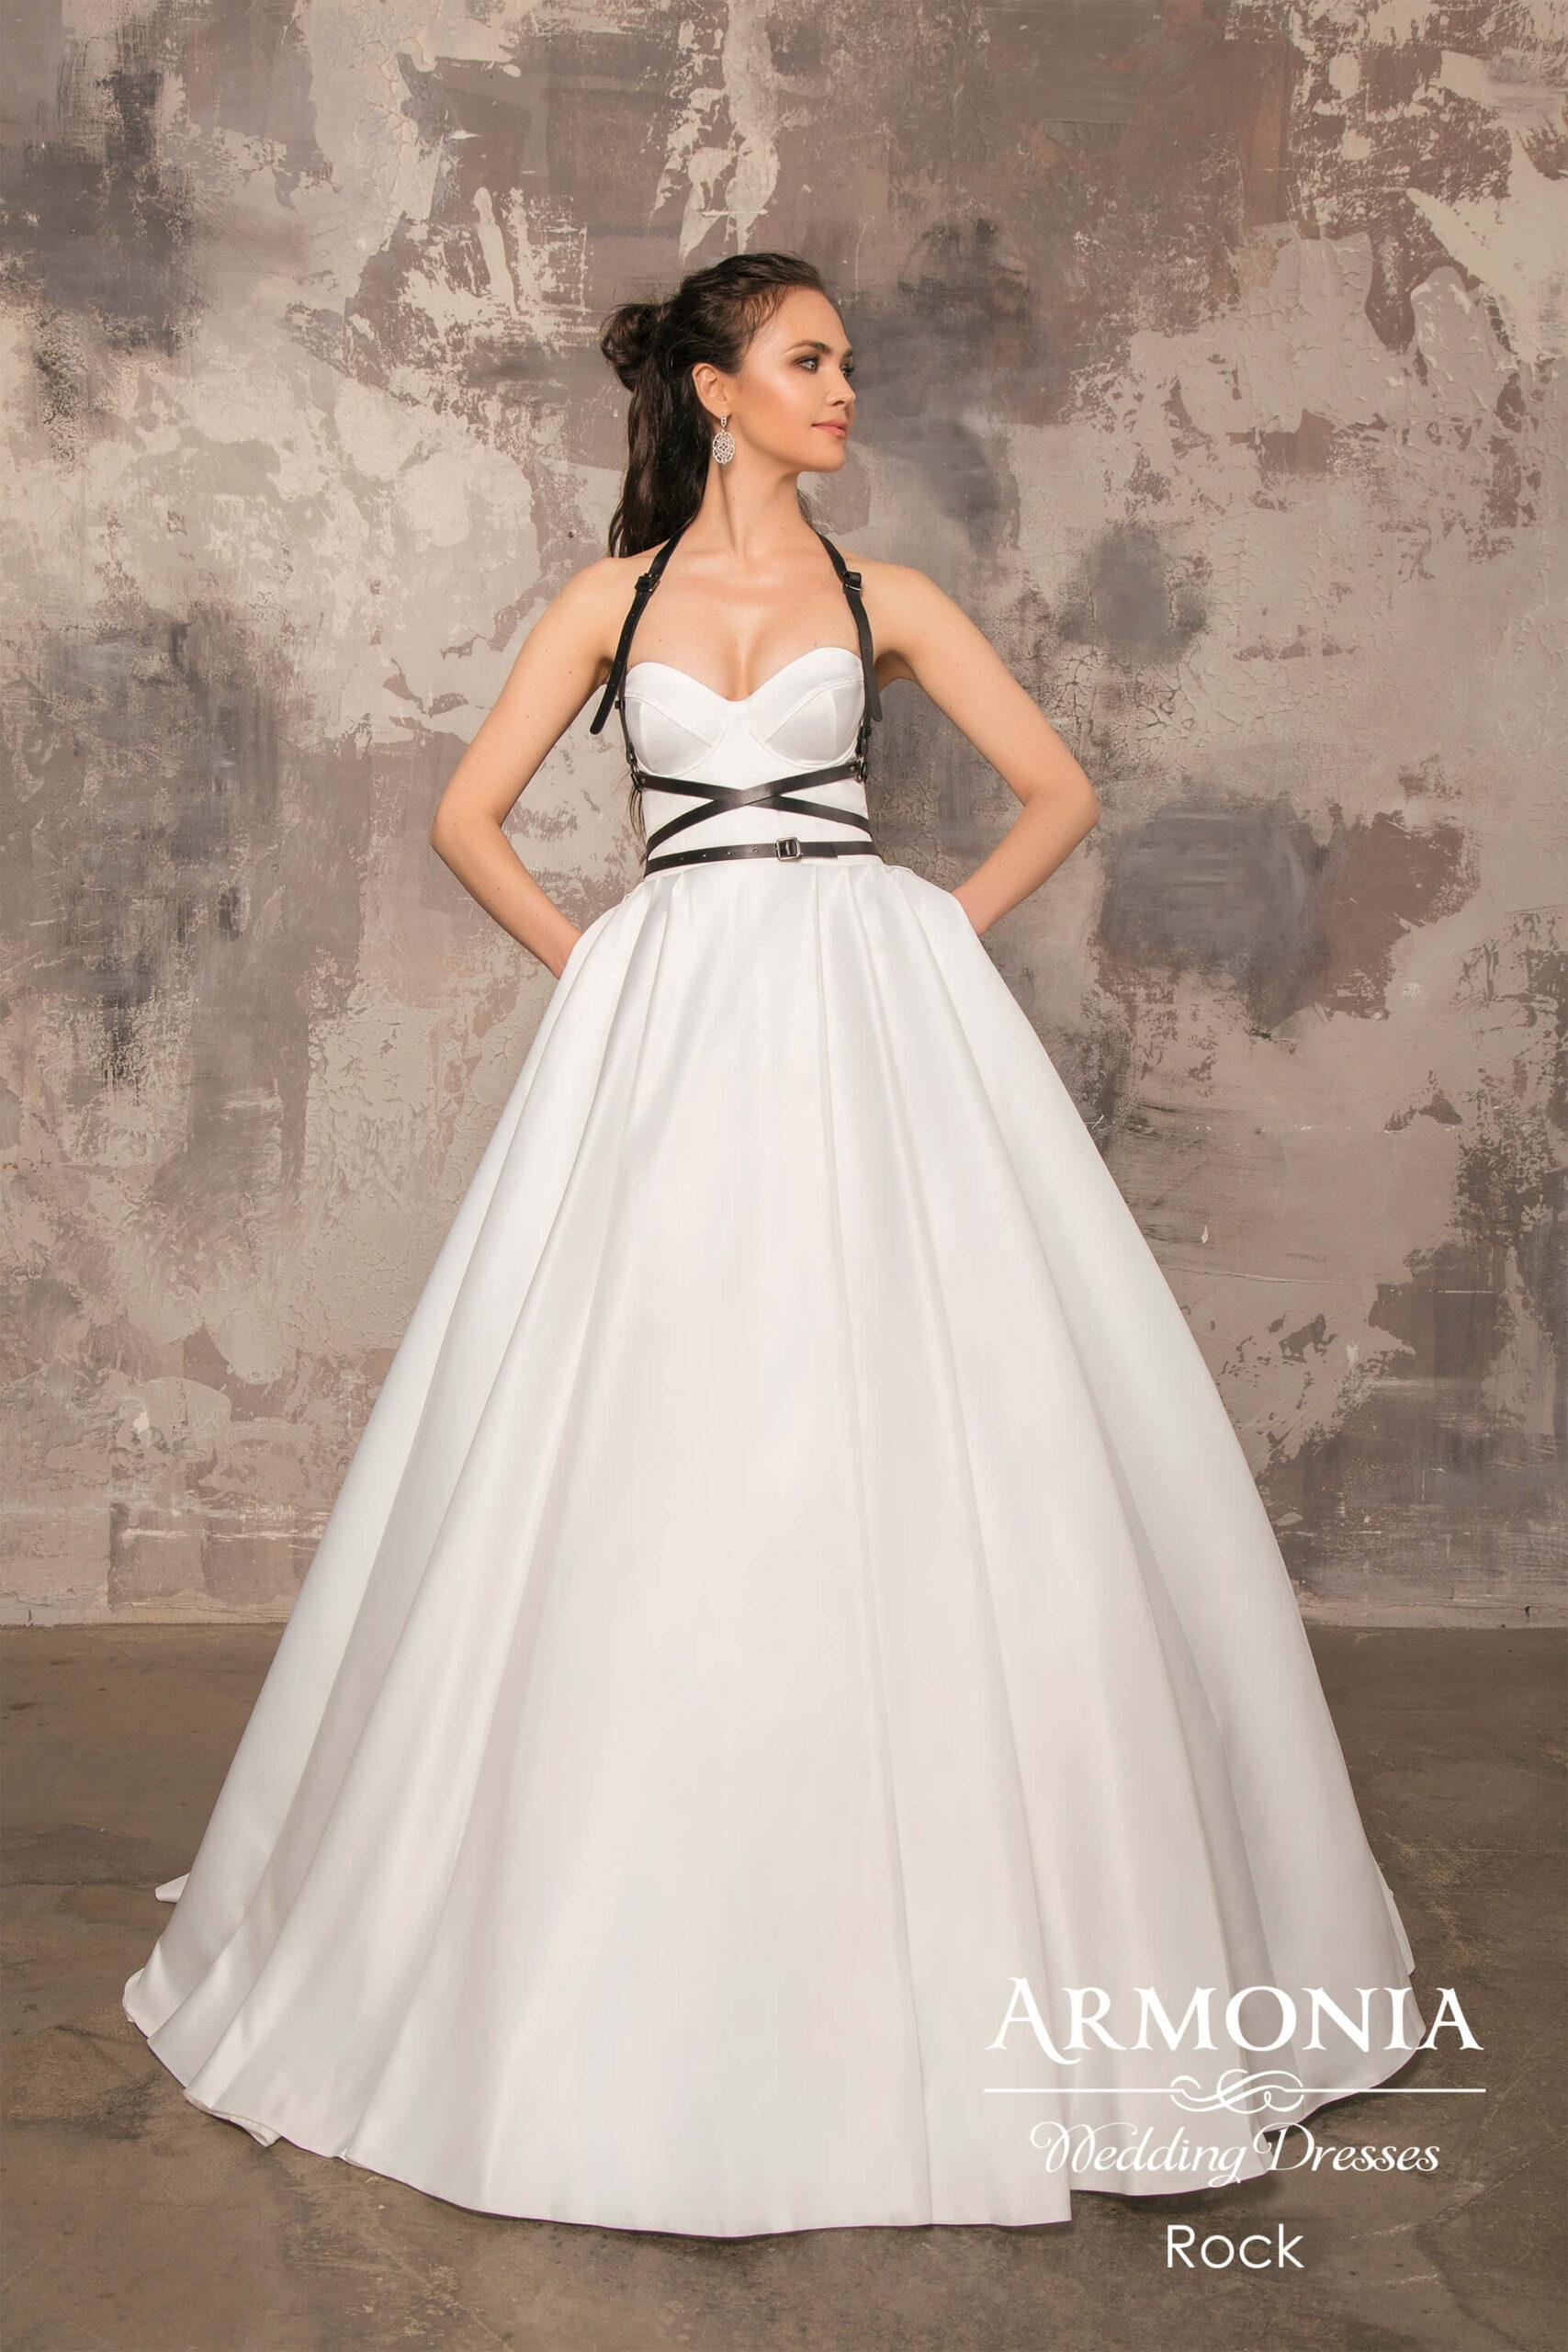 Cвадебное платье Rock Armonia